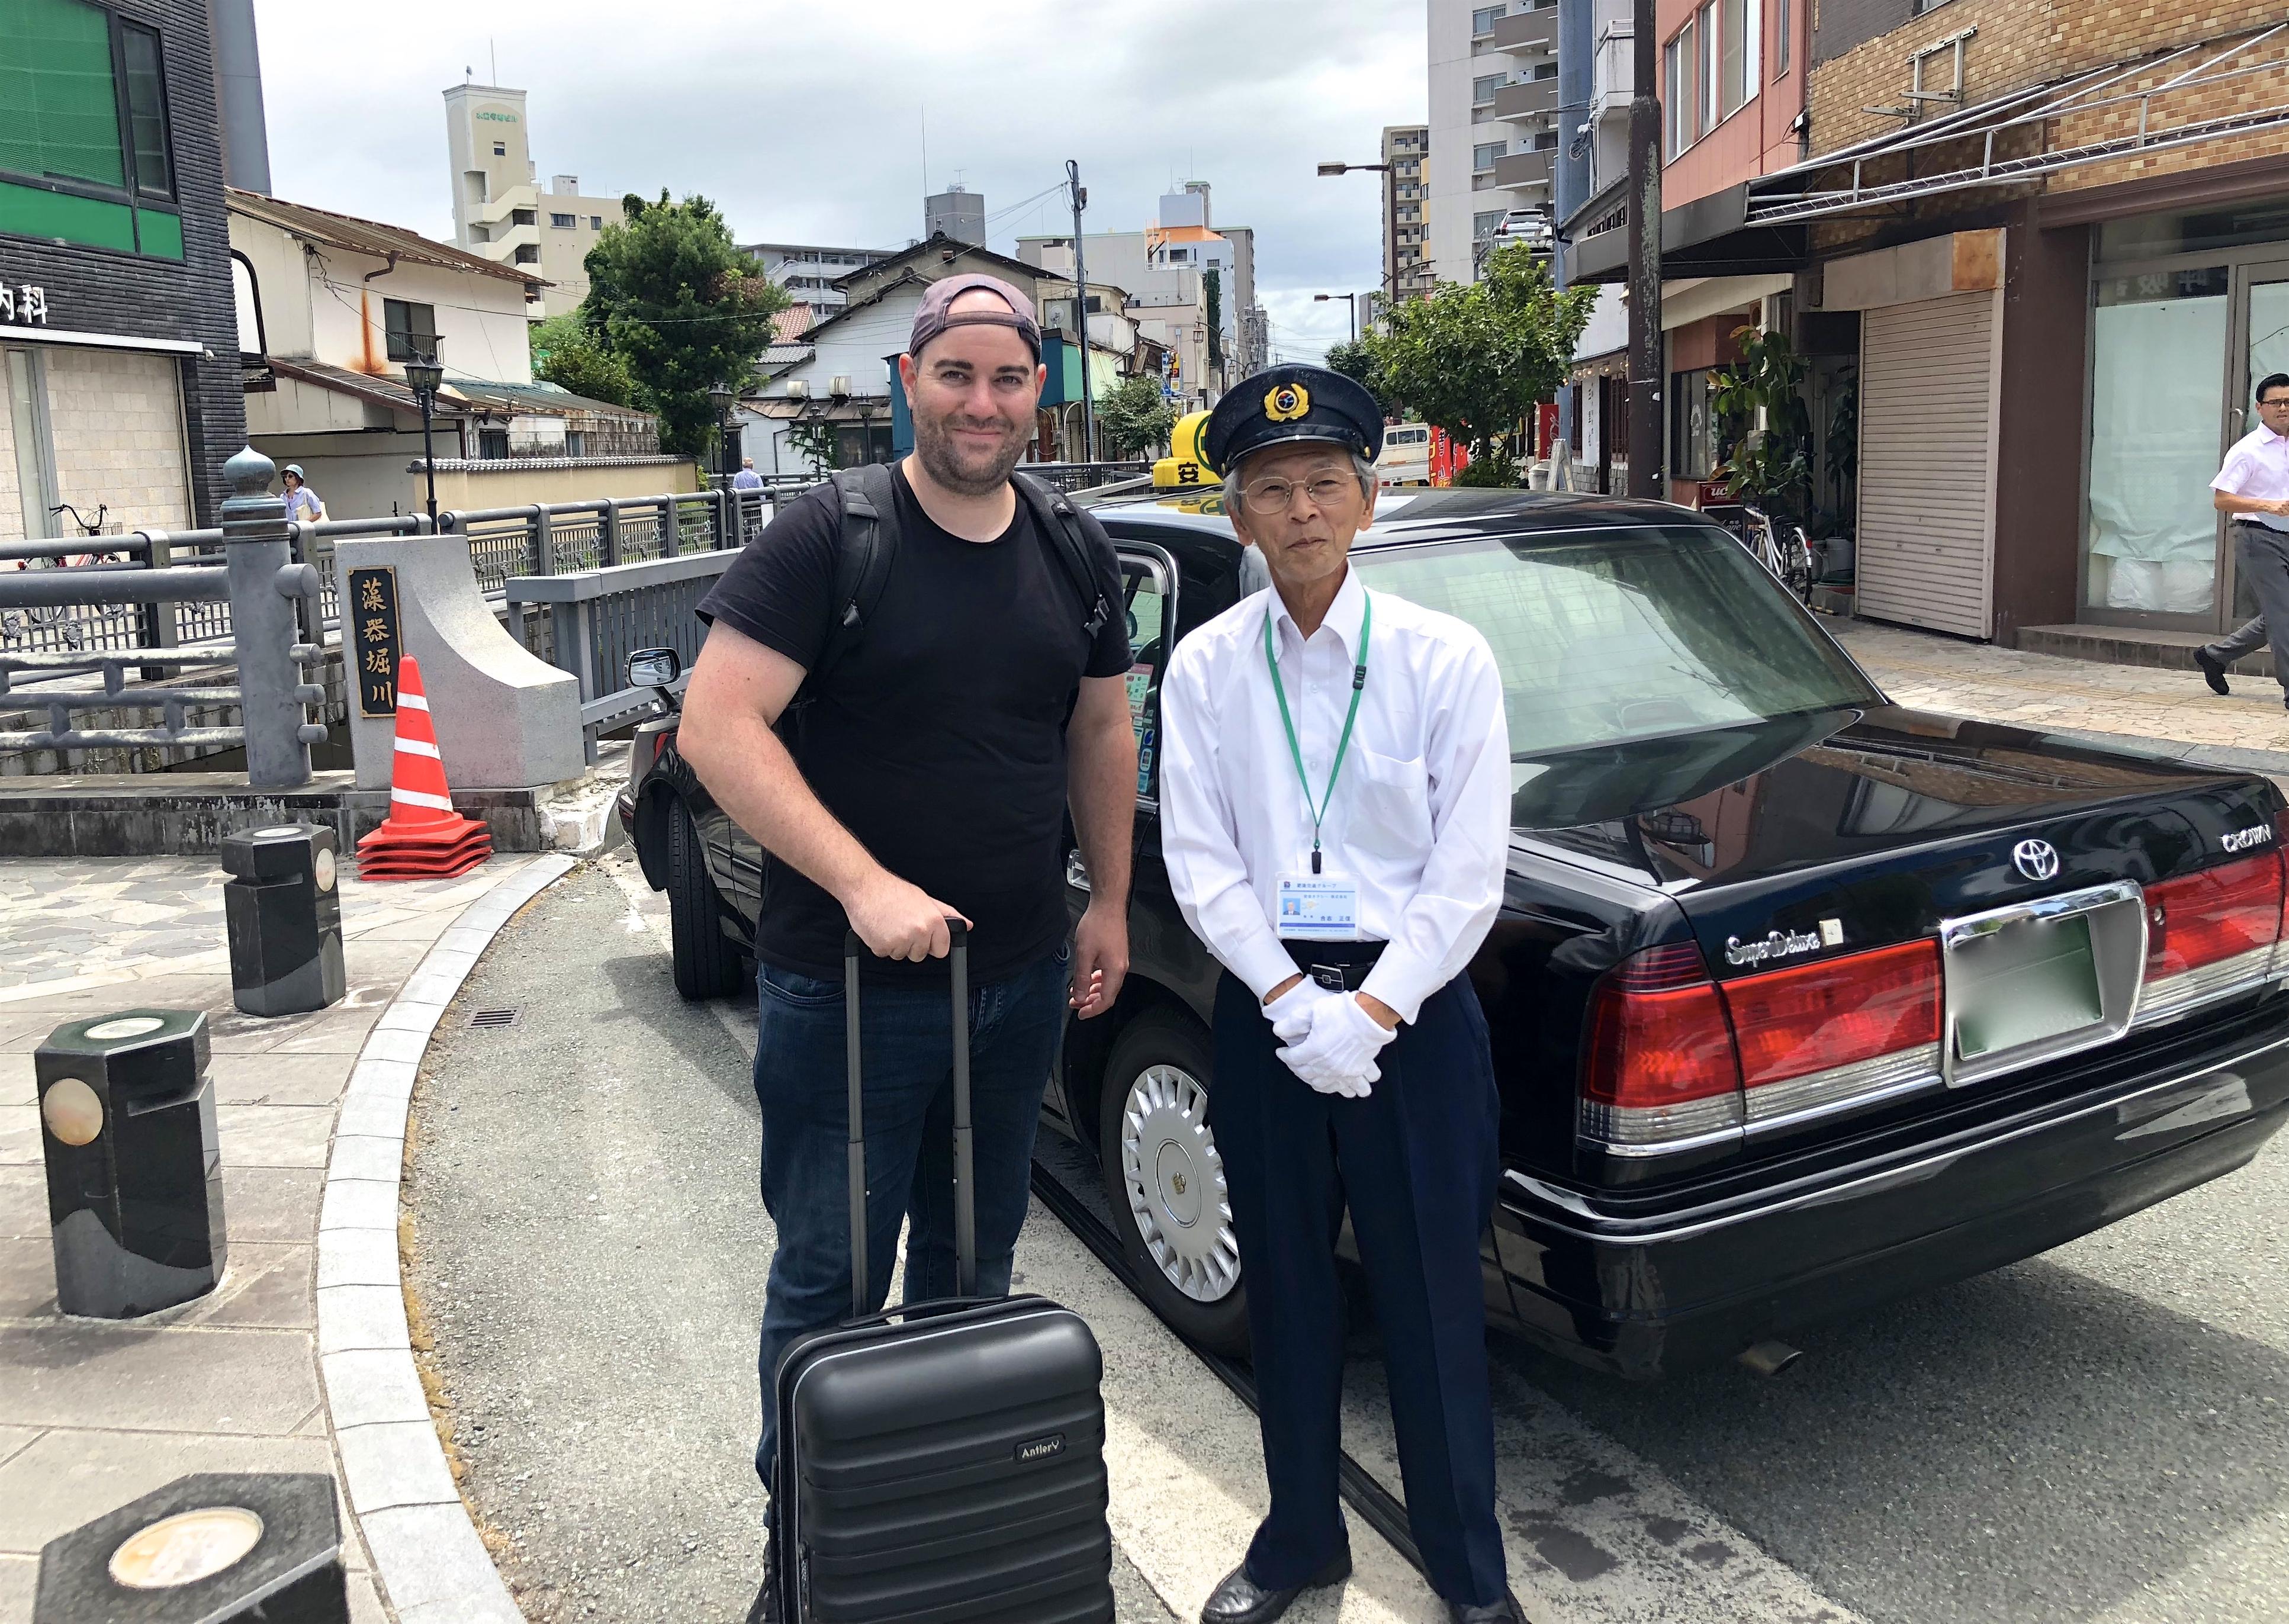 kumamoto city, Japan, 2018 31